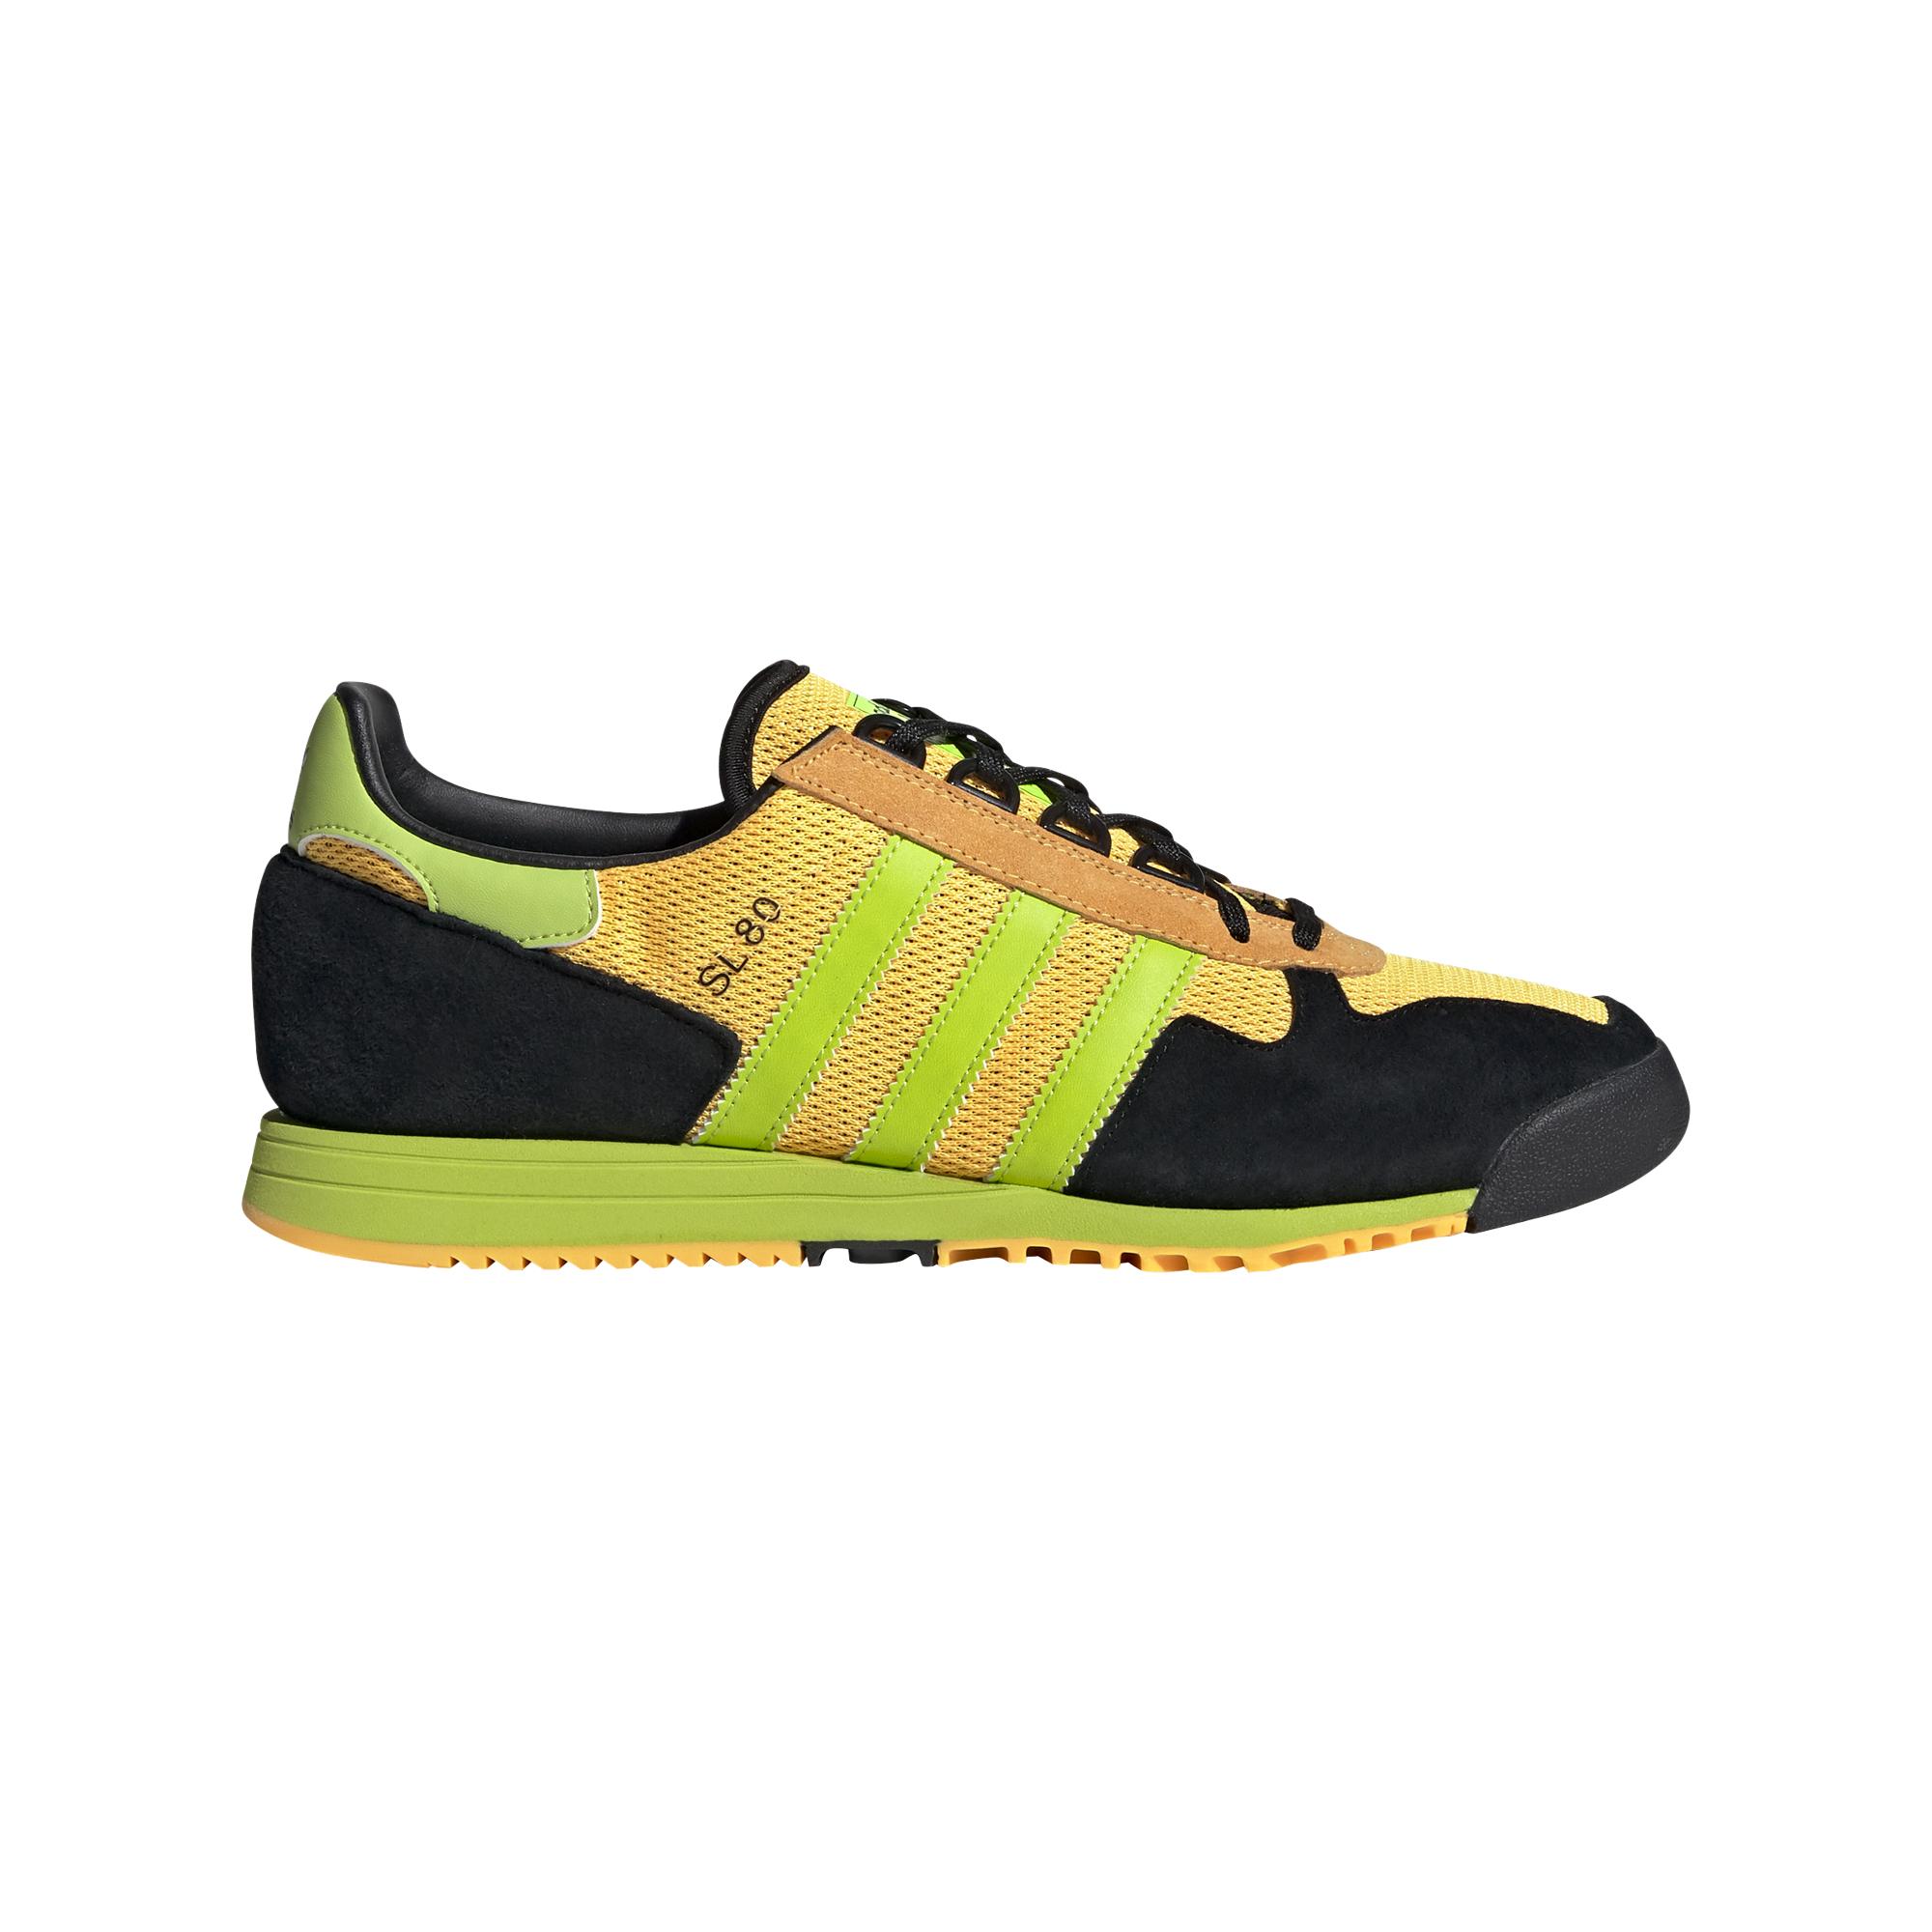 adidas SL 80 Solar Gold/ Semi Solar Slime/ Core Black, Yellow